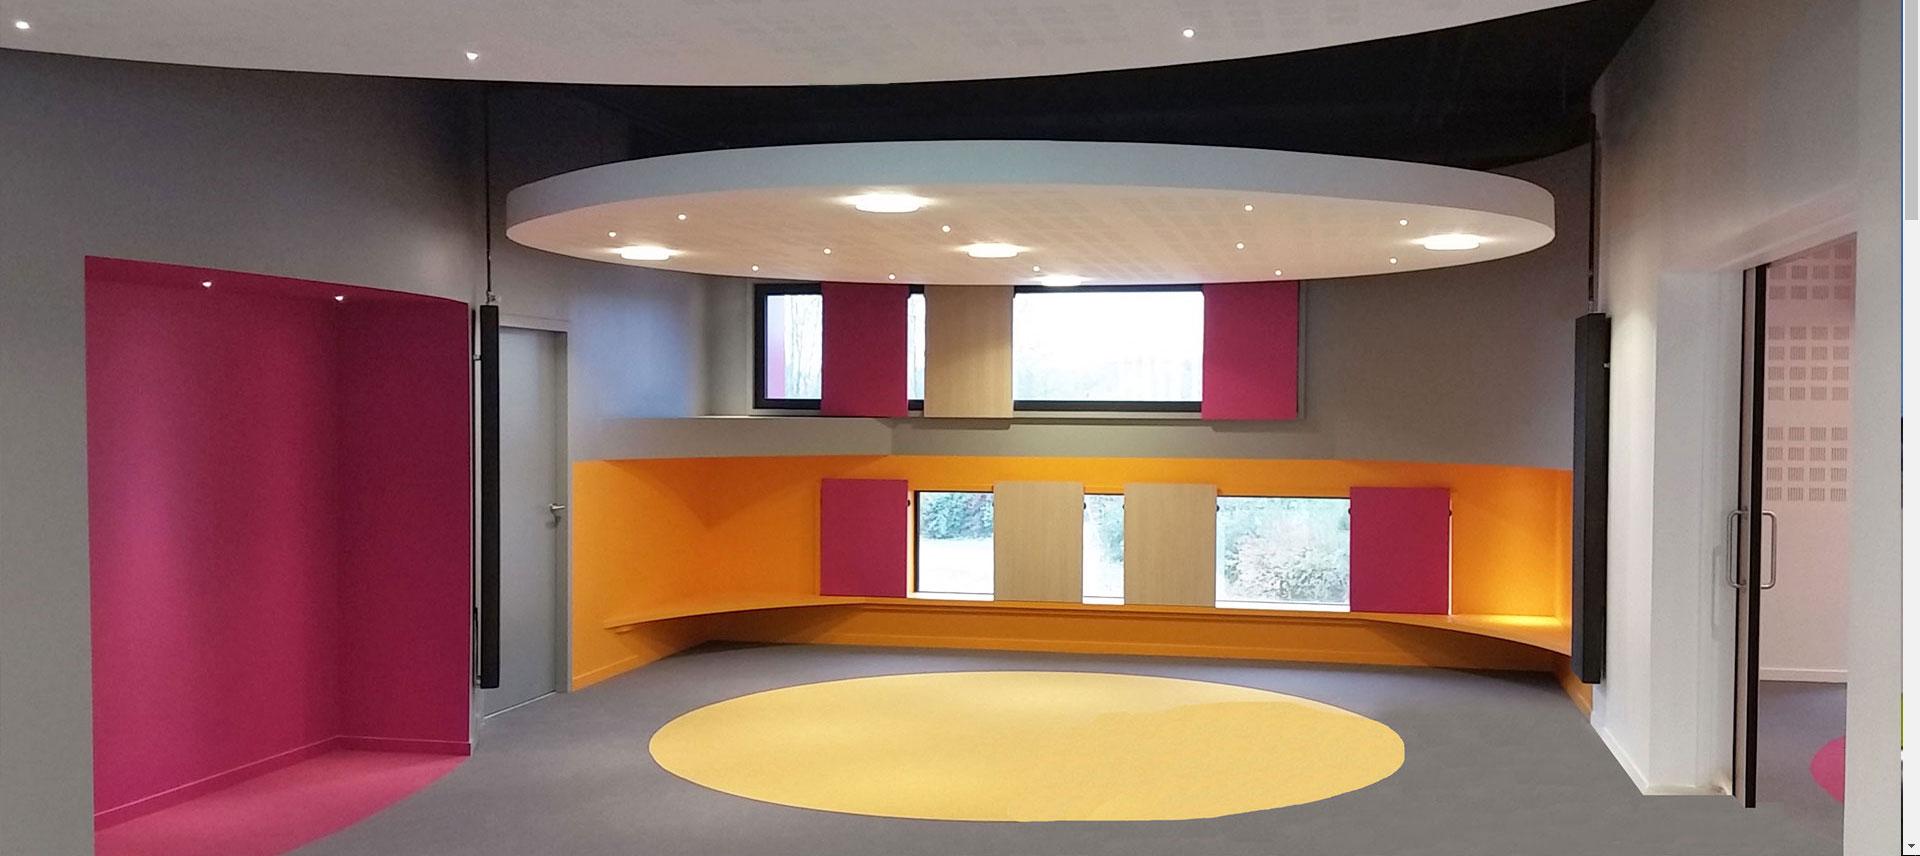 archimage et associ s cabinet d 39 architectes. Black Bedroom Furniture Sets. Home Design Ideas